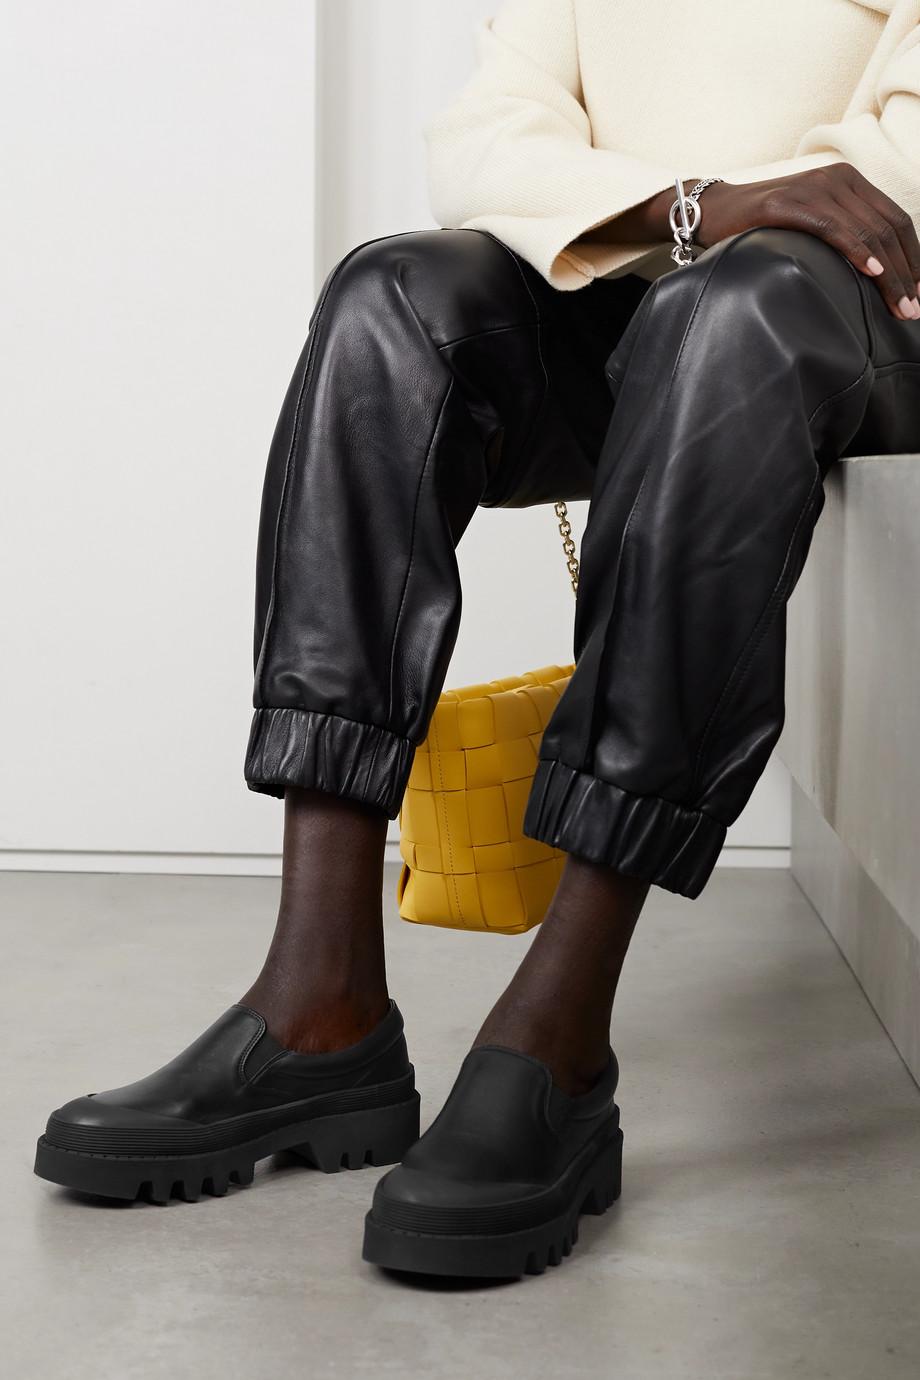 Proenza Schouler City Loafers aus Leder mit Gummibesatz